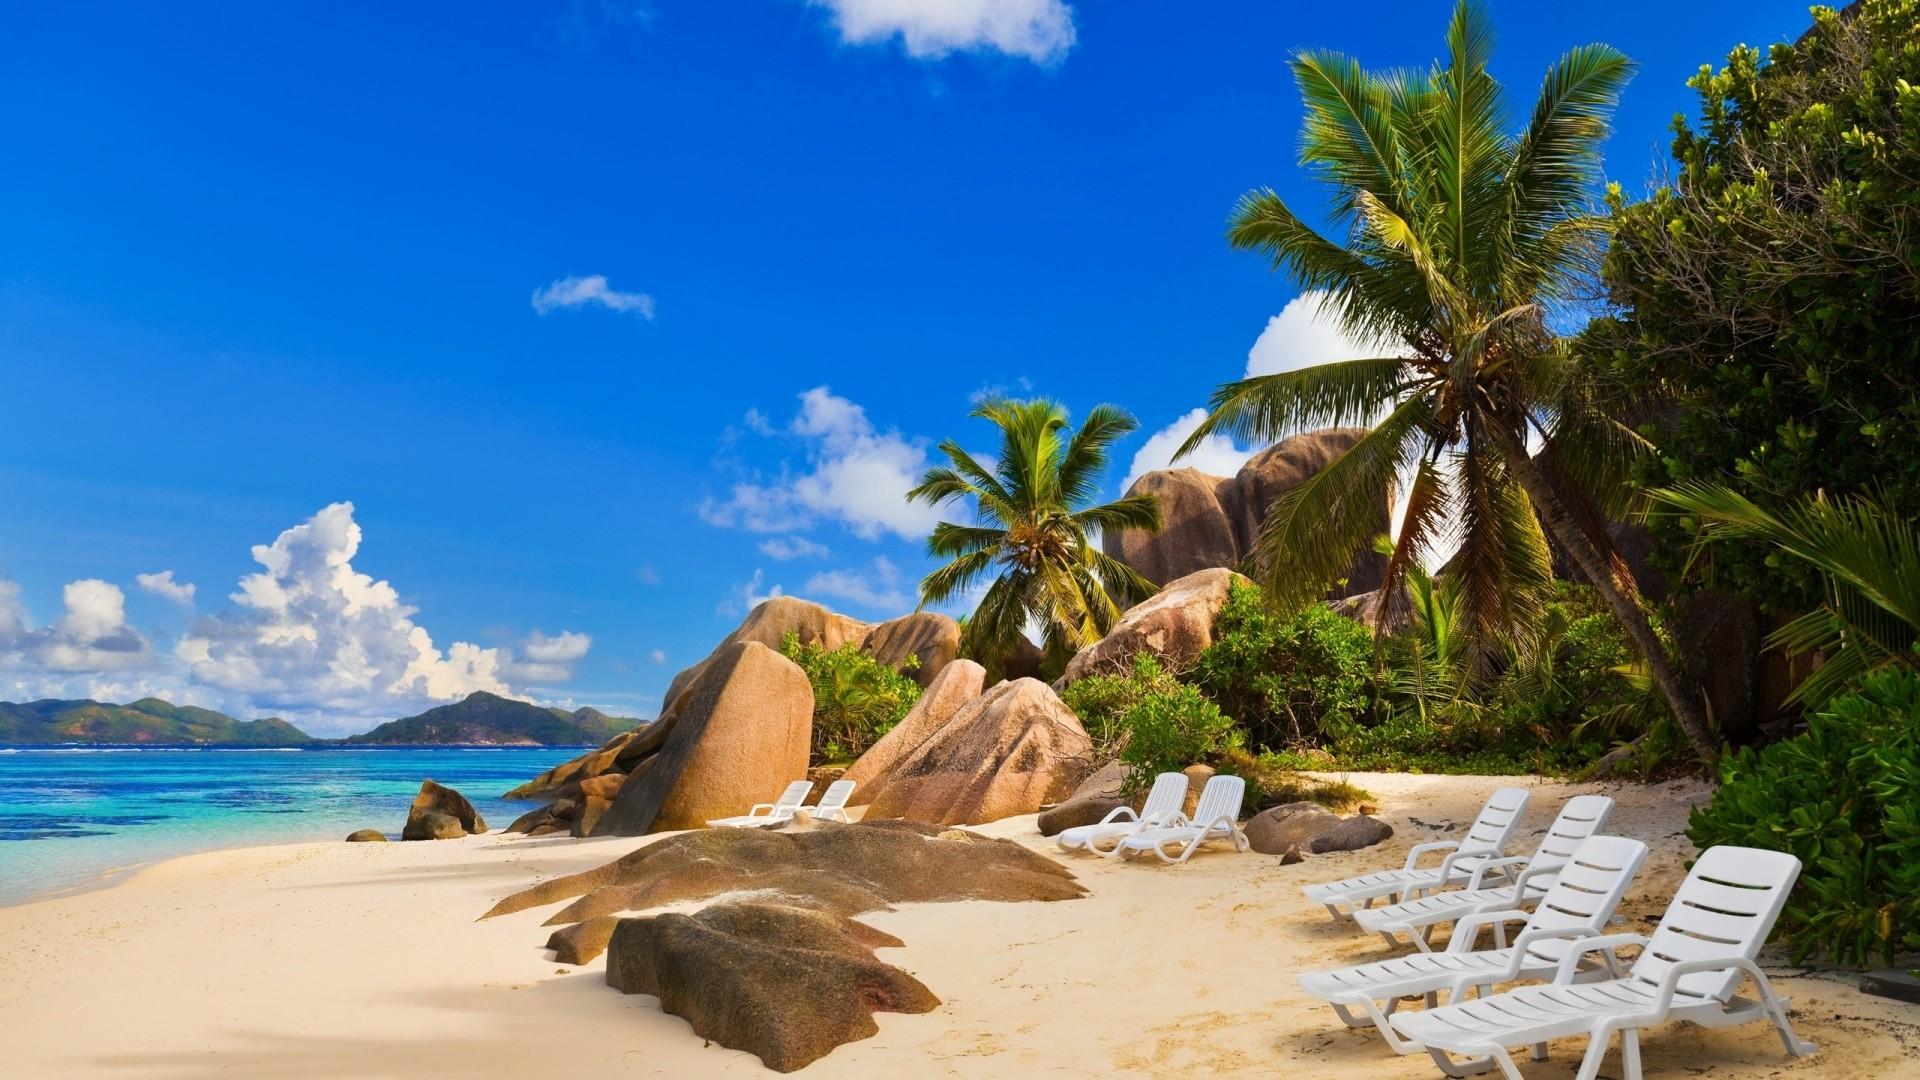 Wallpaper beach, palm trees, sky, island, coast, resort, relax